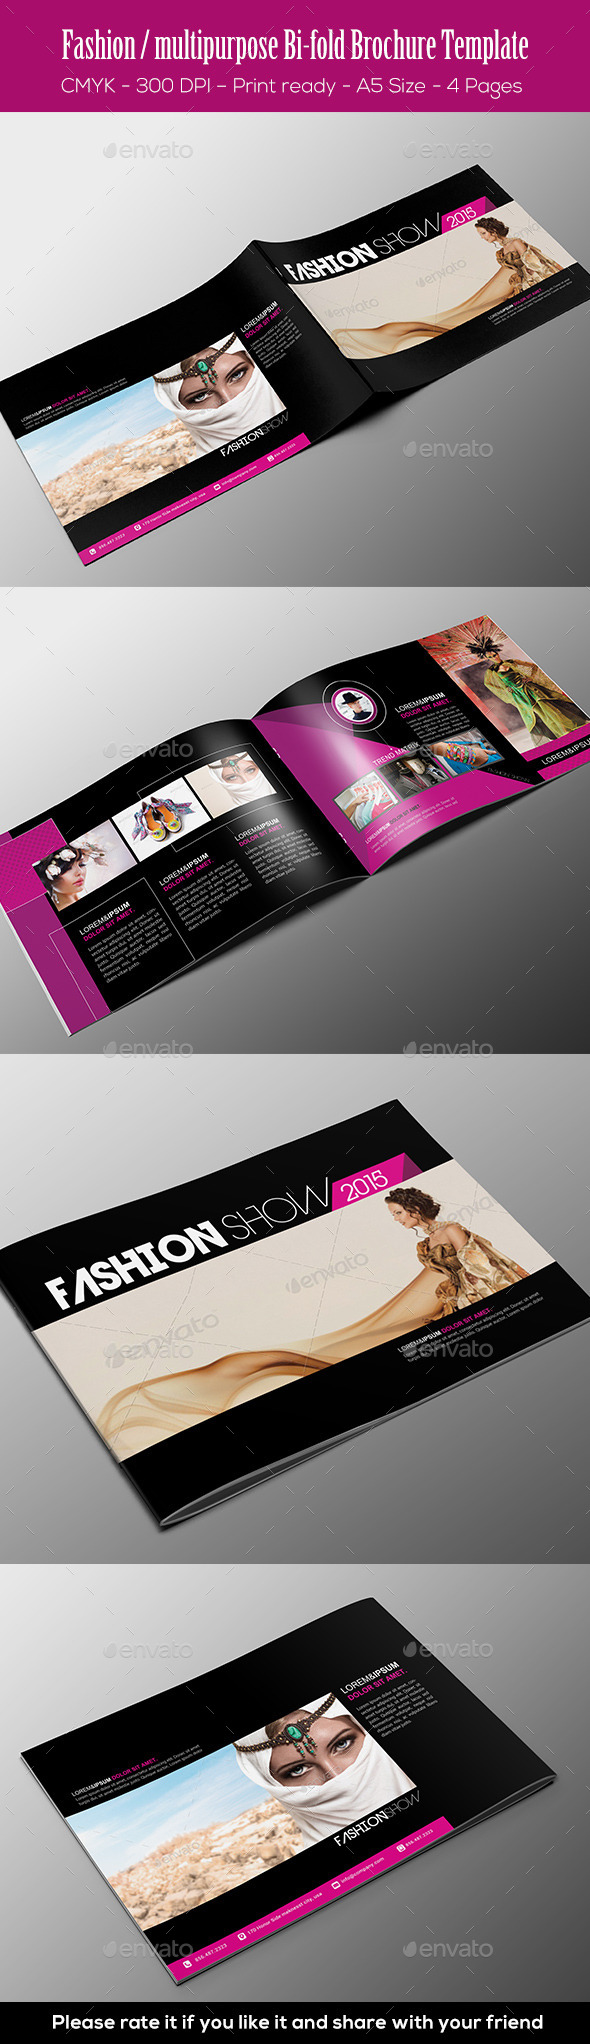 Fashion / Multipurpose Bi-fold Brochure Template - Brochures Print Templates